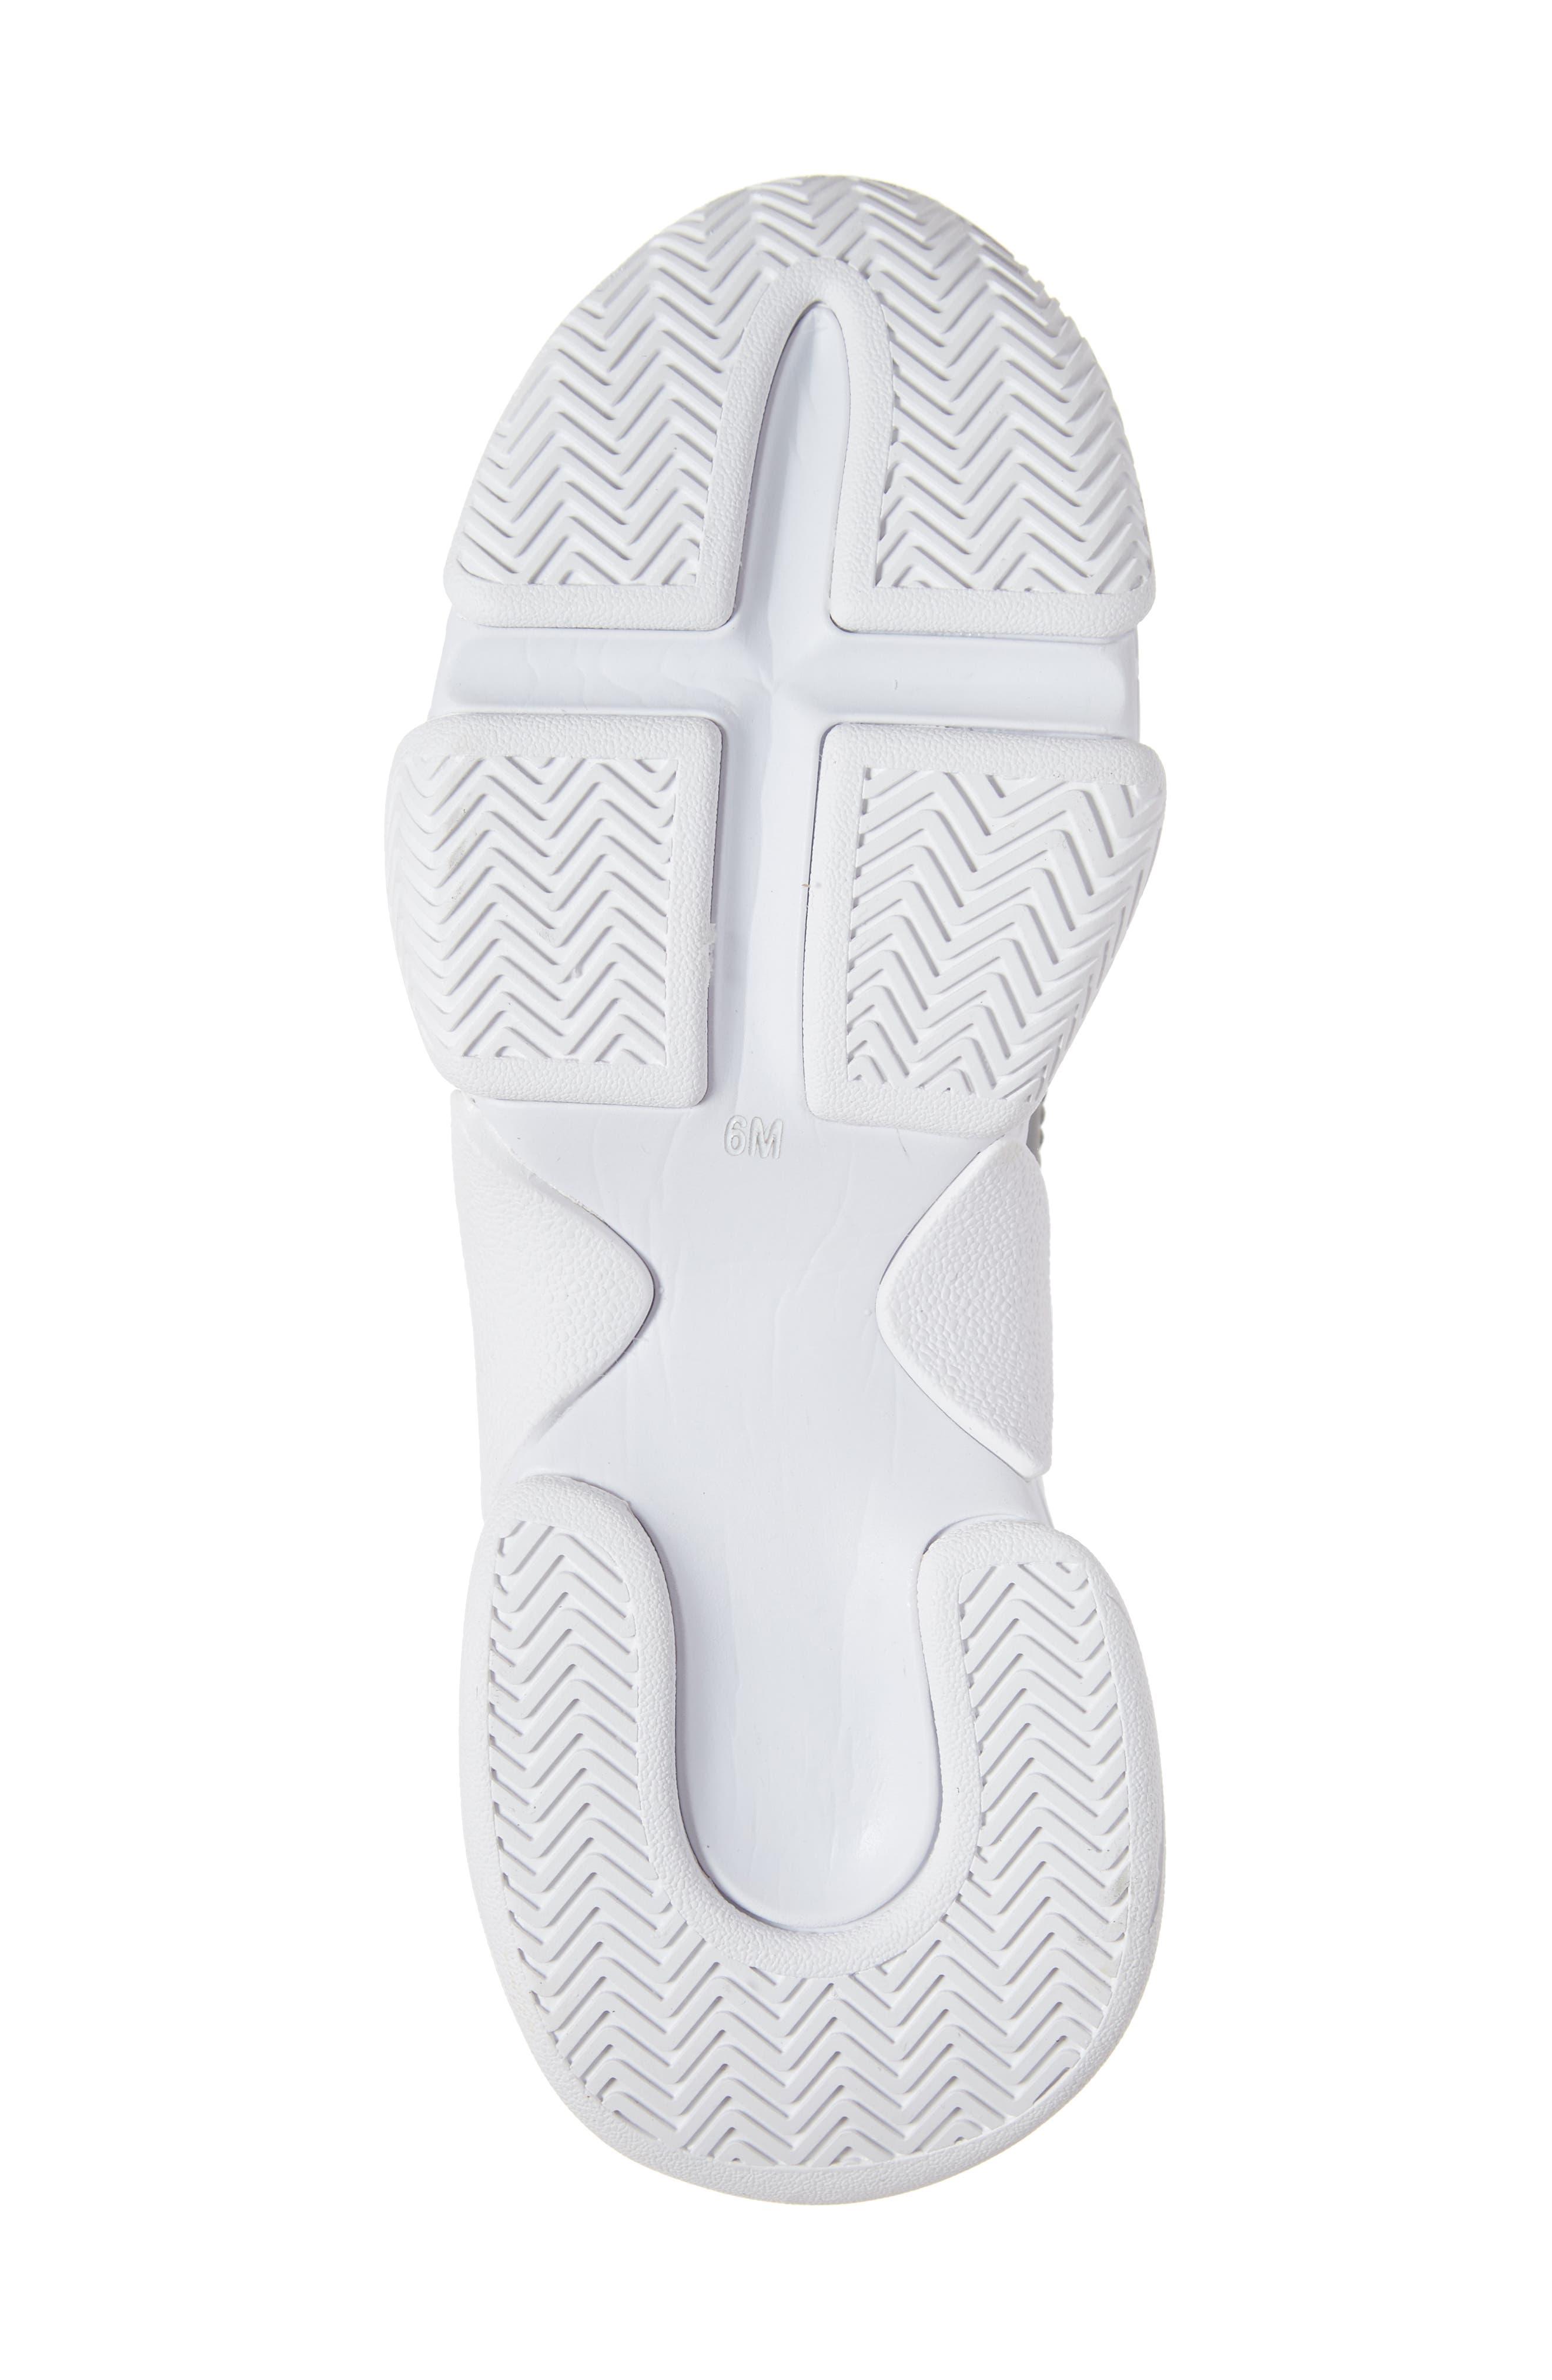 Lo-Fi Sneaker,                             Alternate thumbnail 6, color,                             020